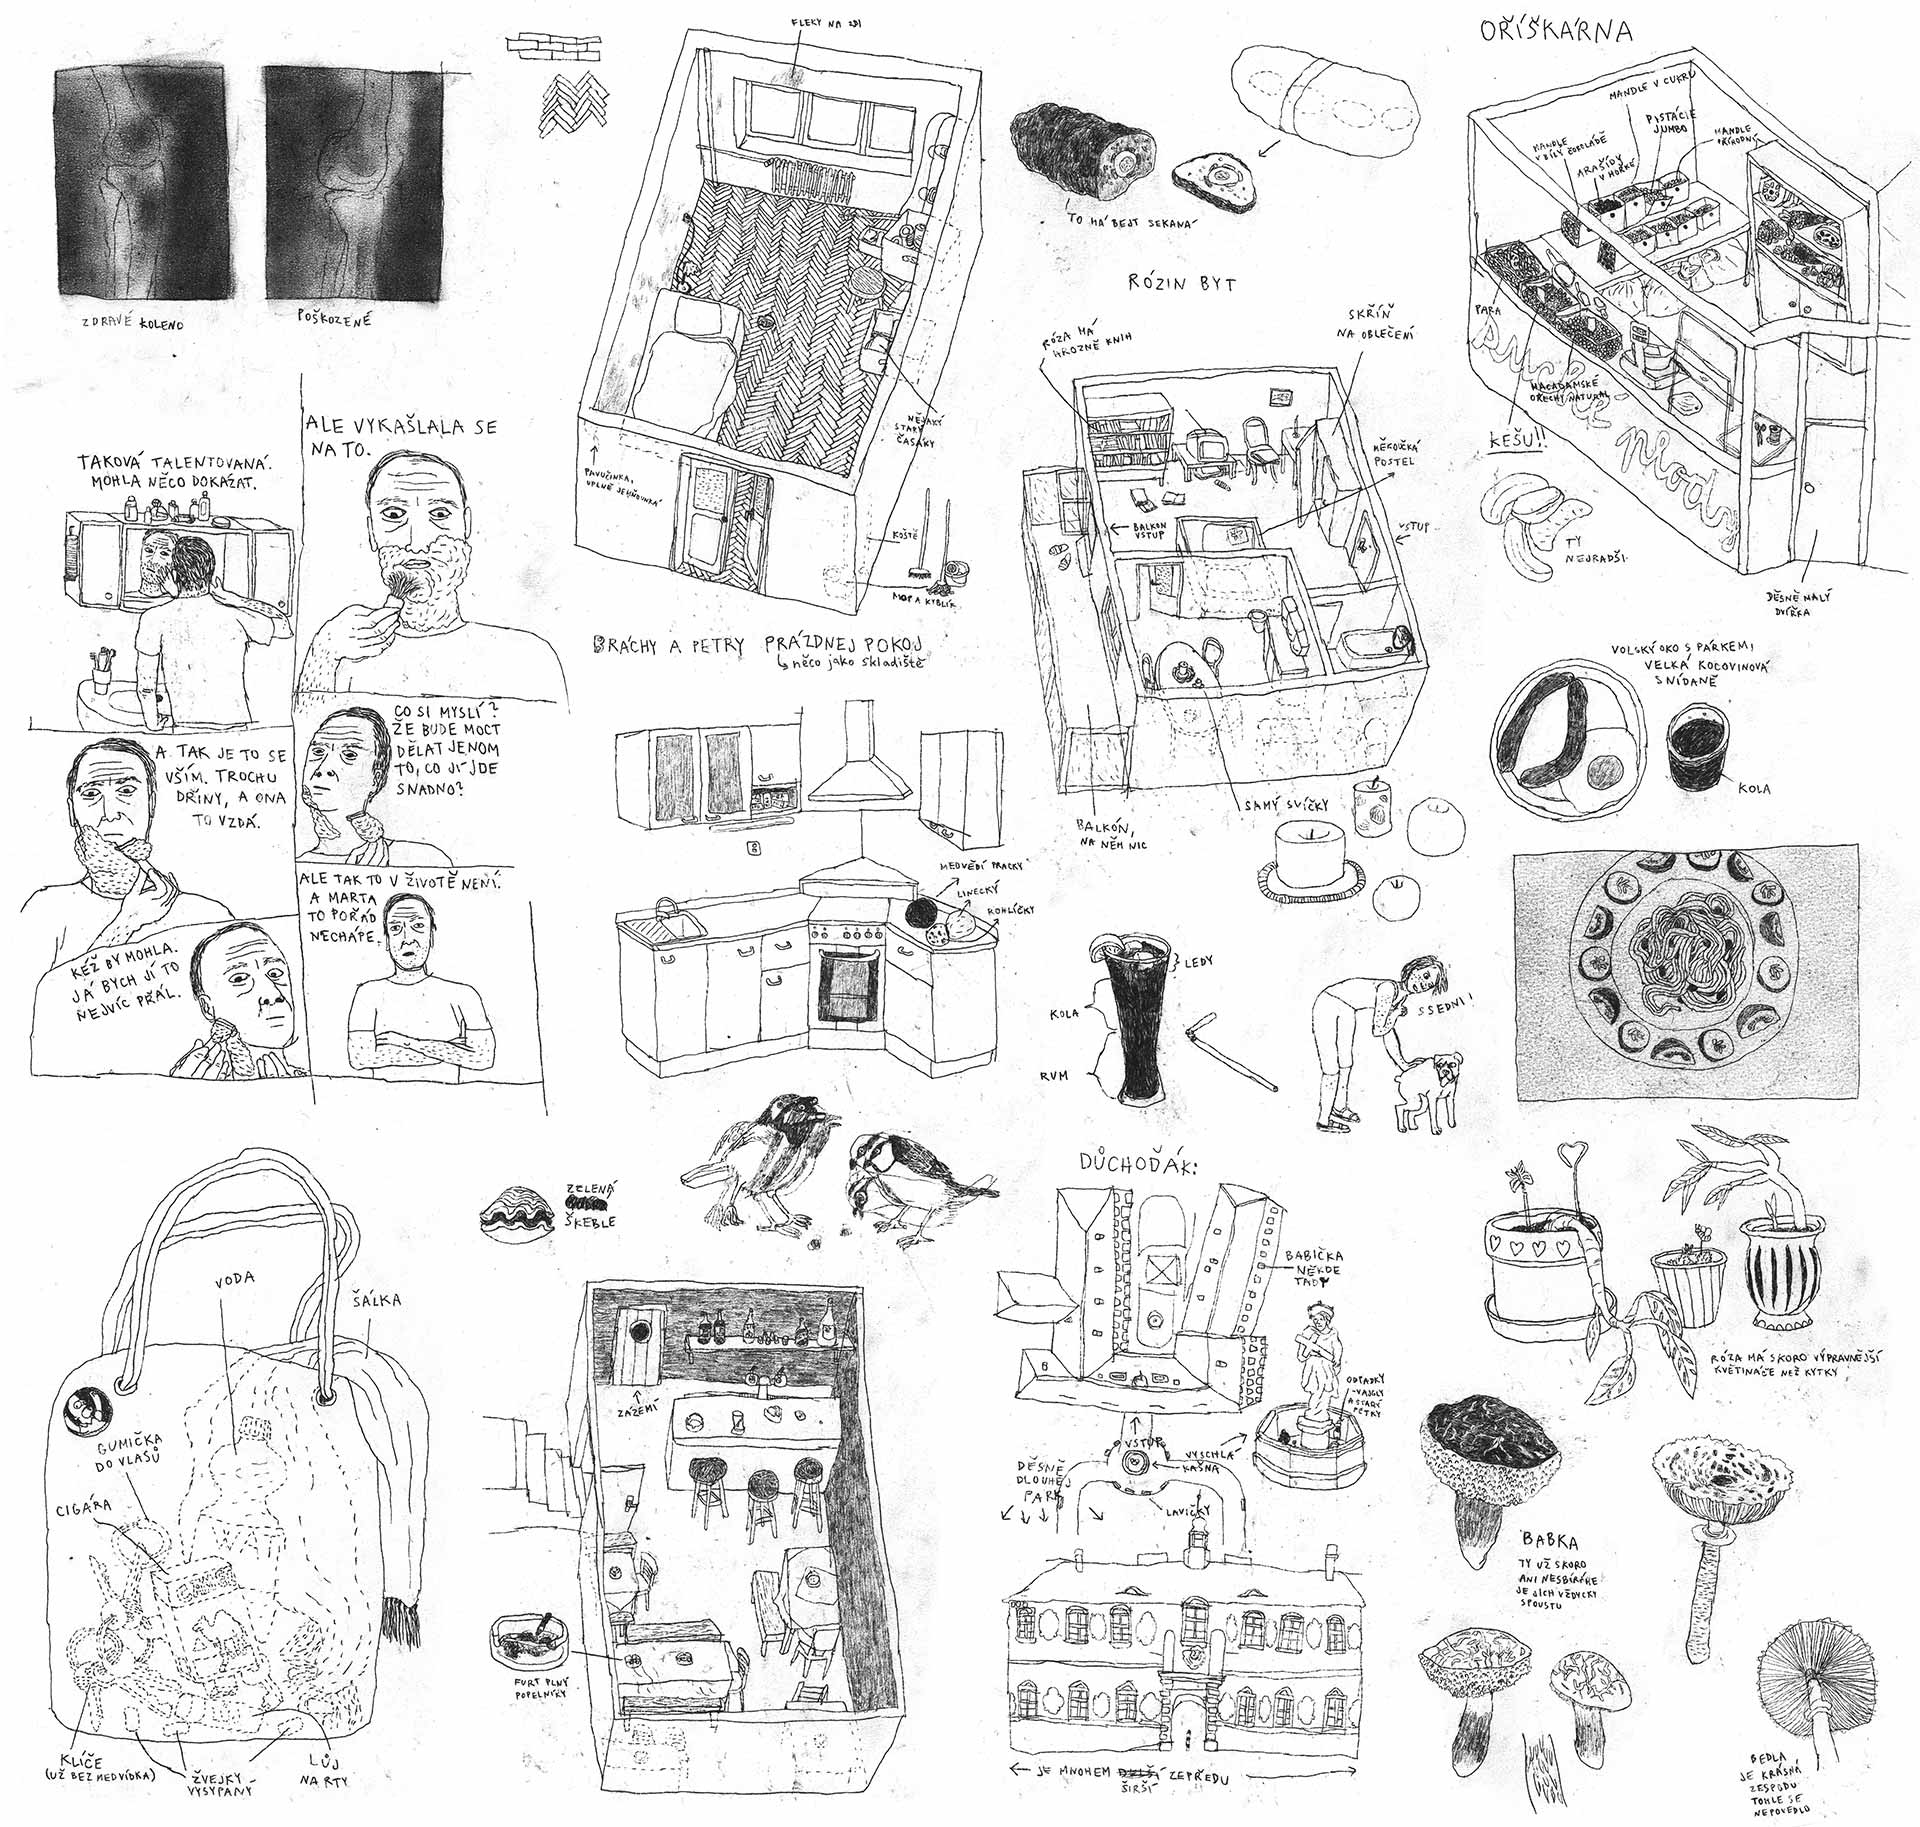 Marta_ilustrace-data-01-b